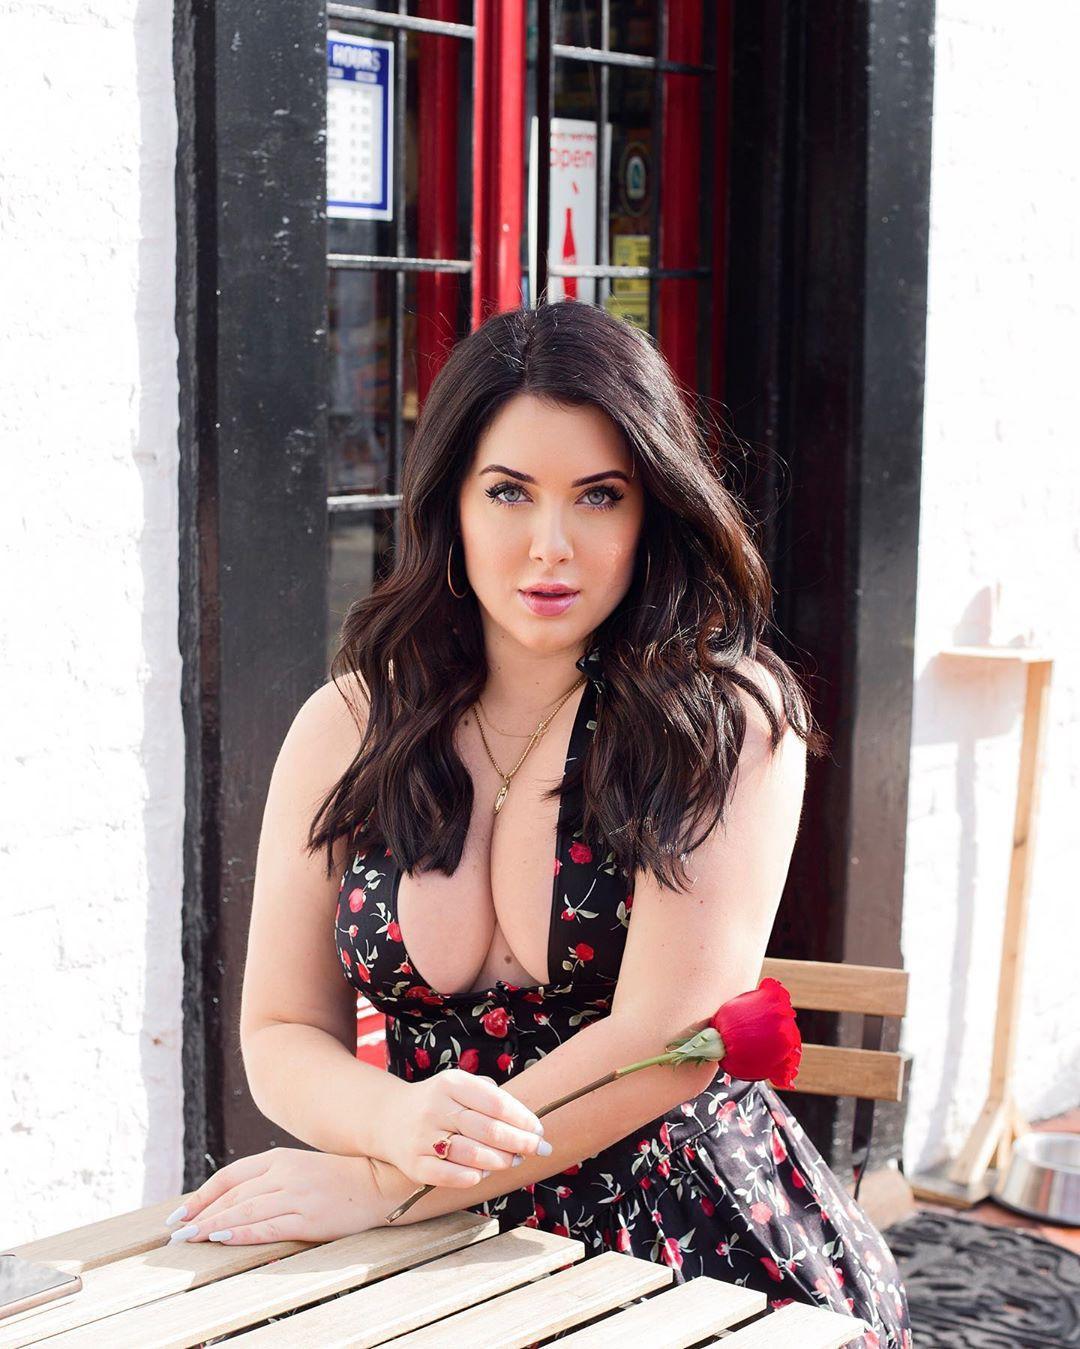 Holly Luyah photoshoot poses, photography ideas, Lip Makeup